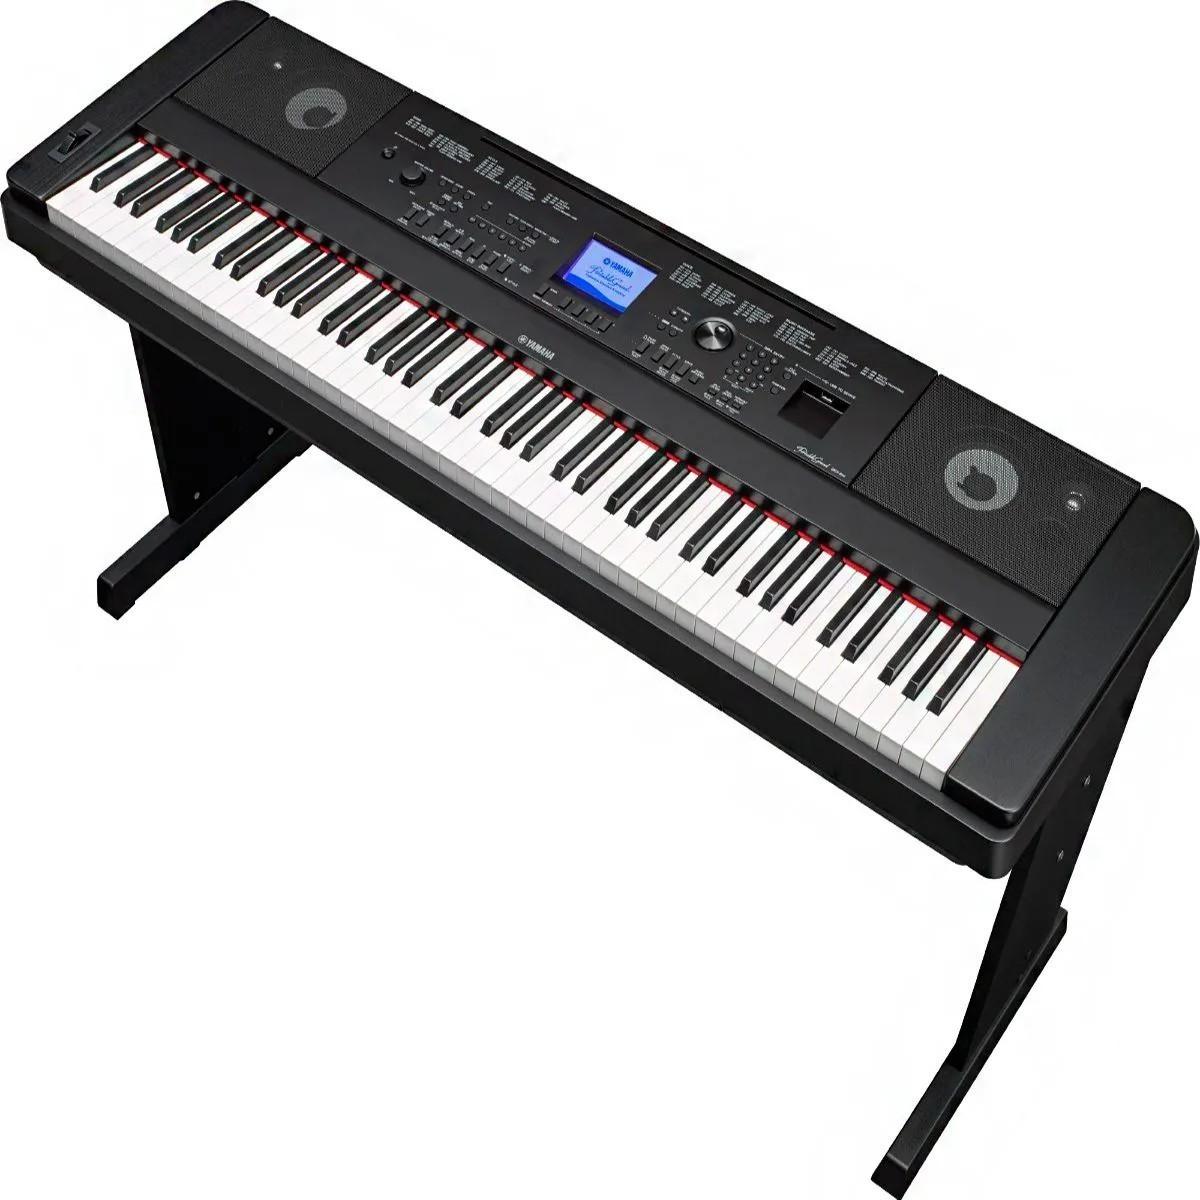 Piano Digital Yamaha DGX660 88 Teclas com Estante